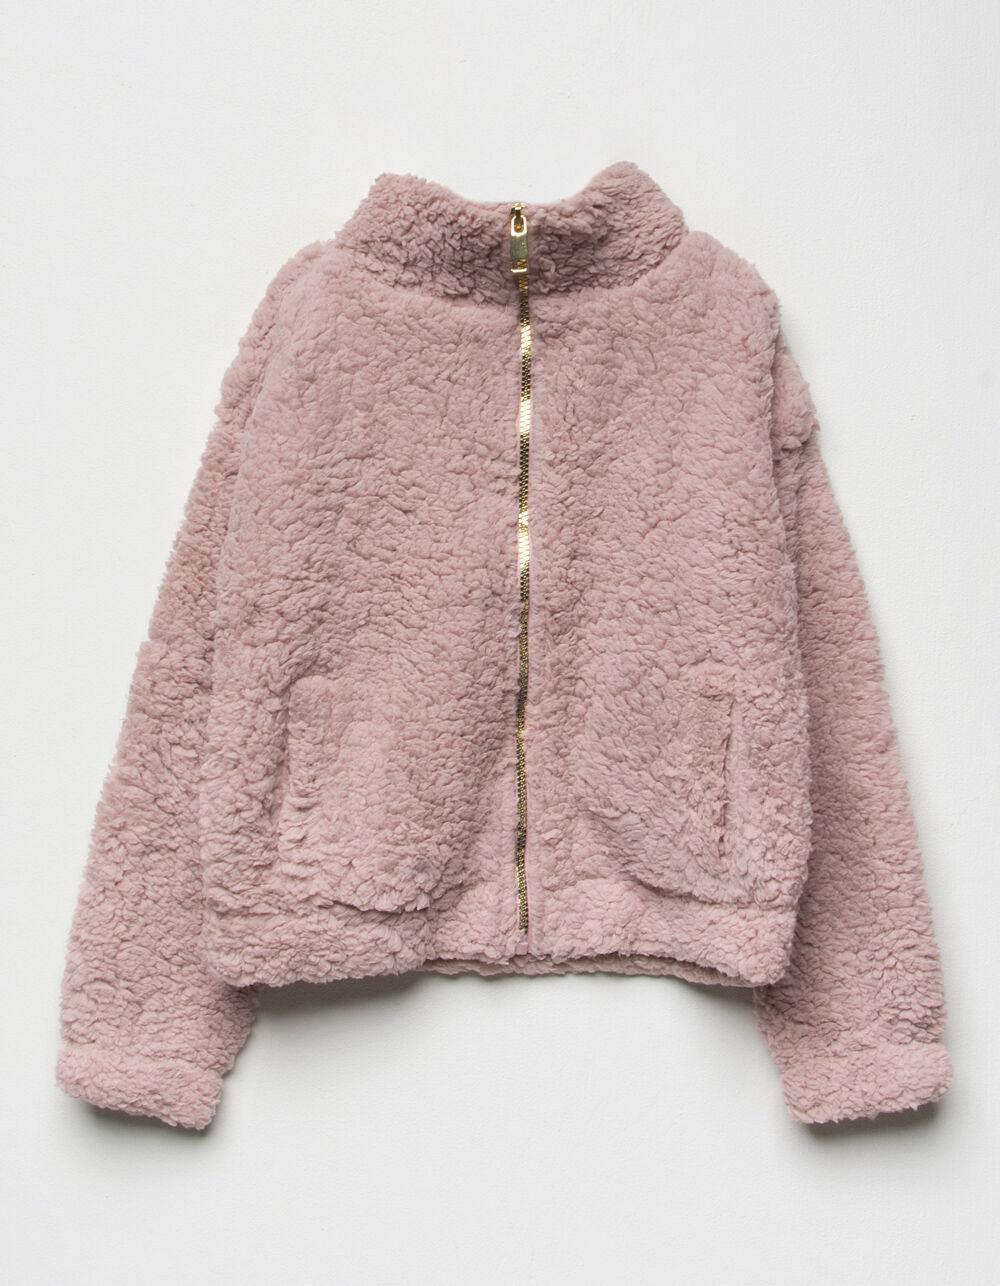 Image of LOVE + JOY Sherpa Mauve Girls Jacket